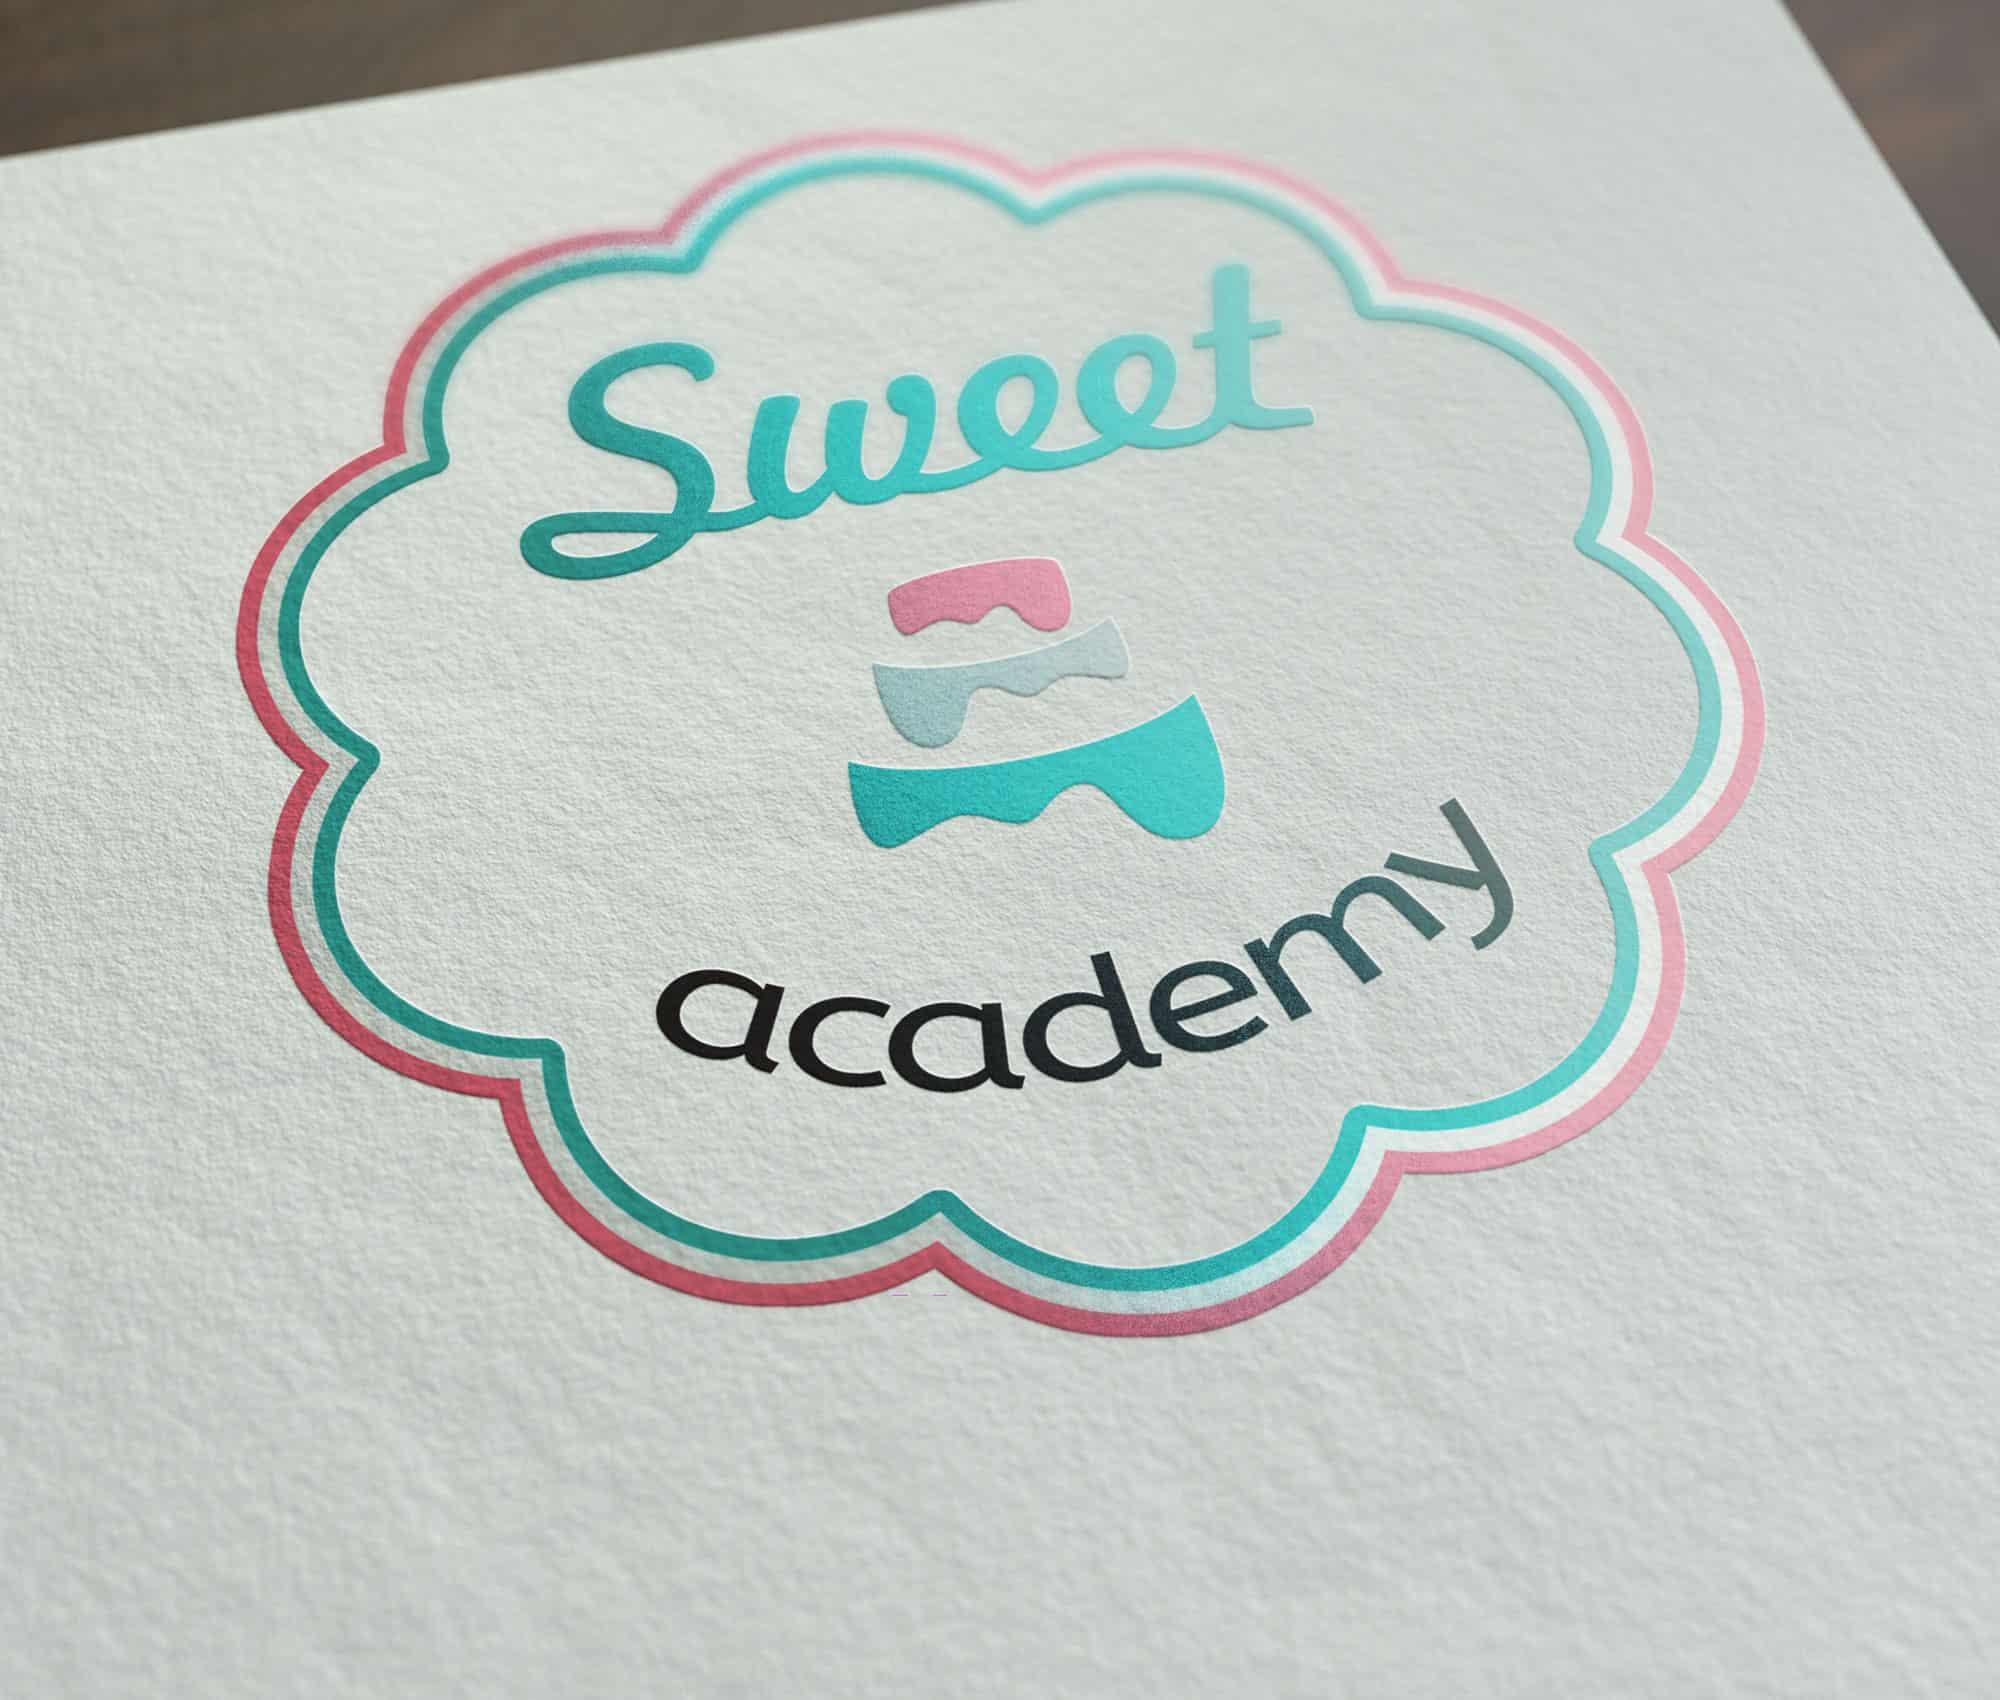 Sweet Academy logo